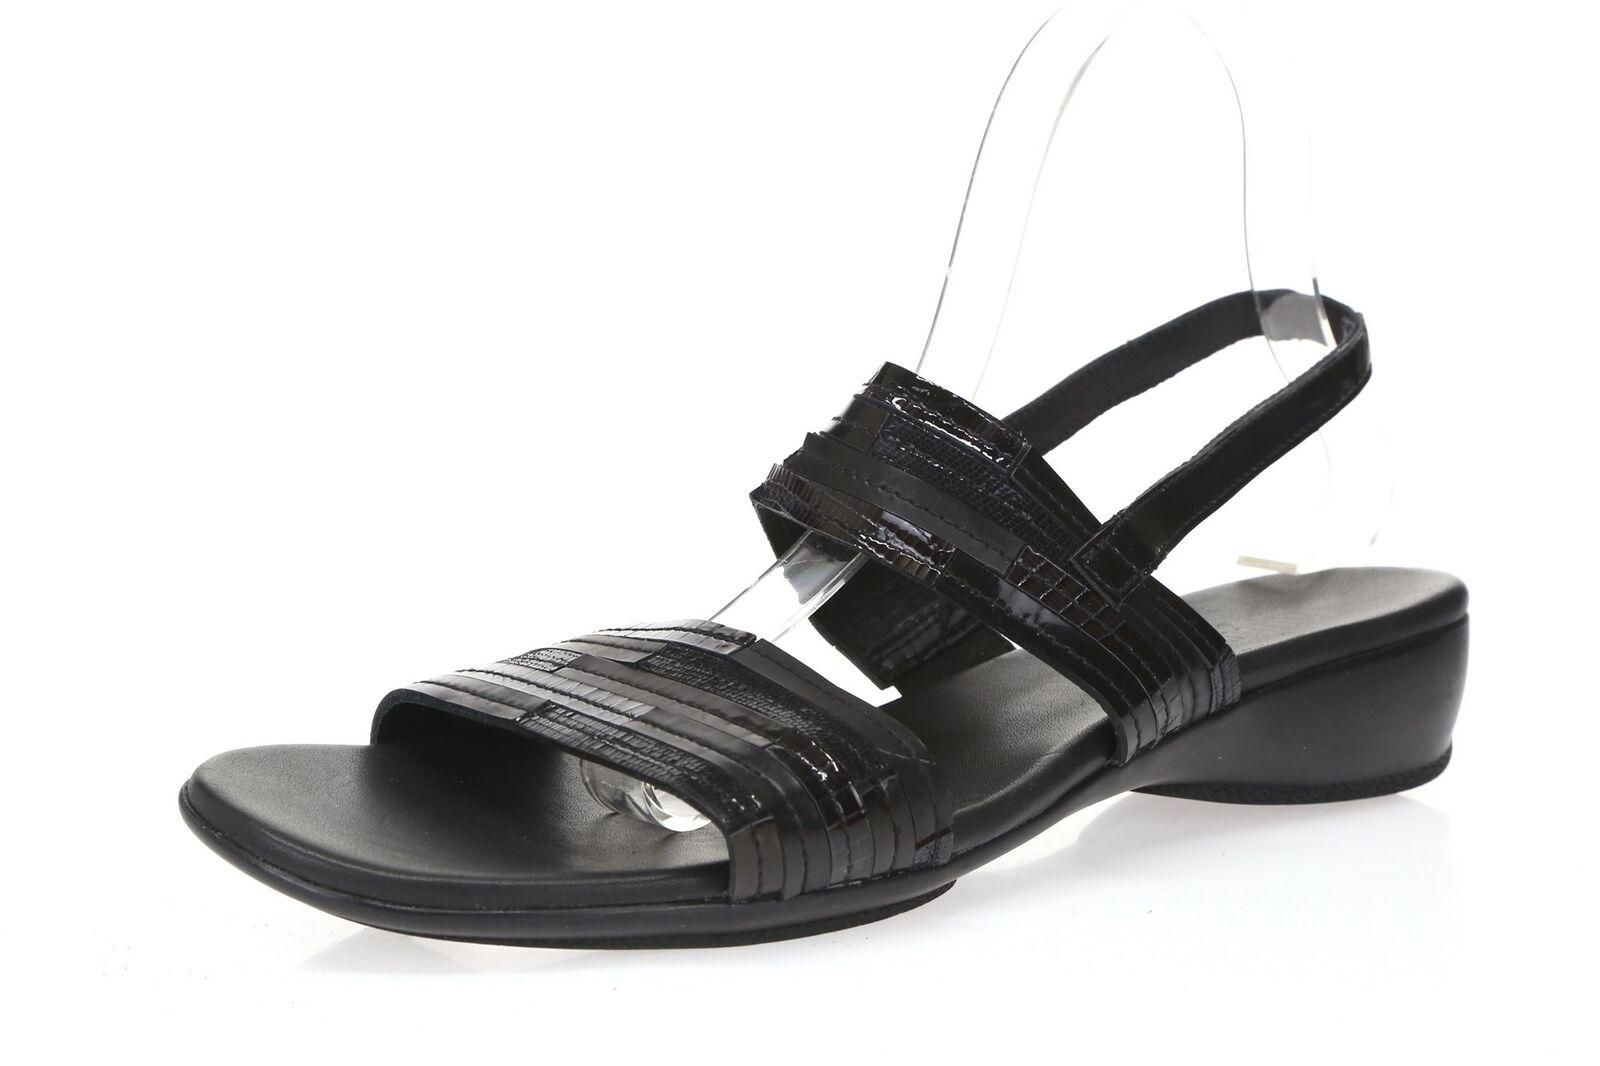 Womens MUNRO AMERICAN black leather slingback sandals sz. 10 SS NEW   190